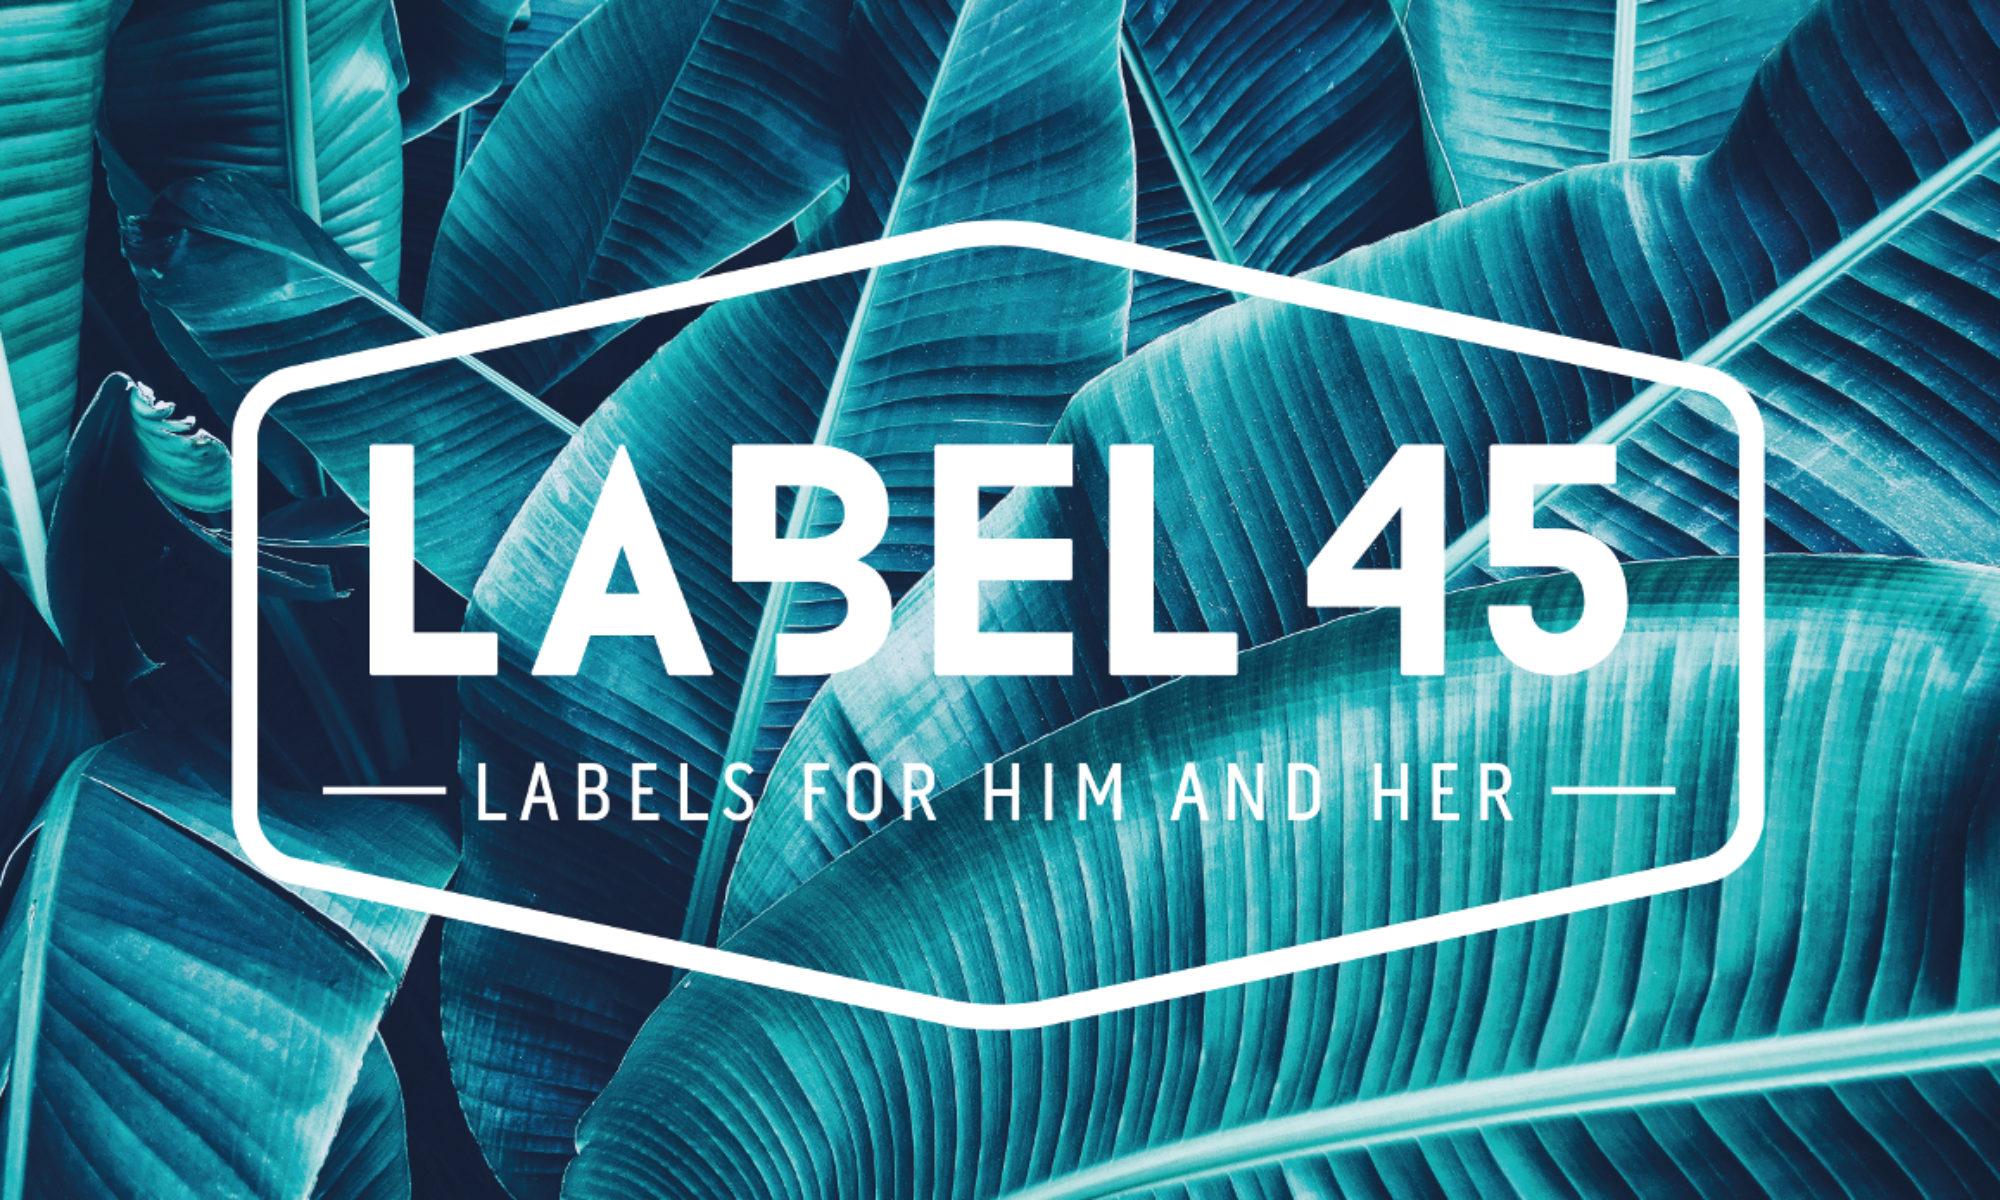 Label45